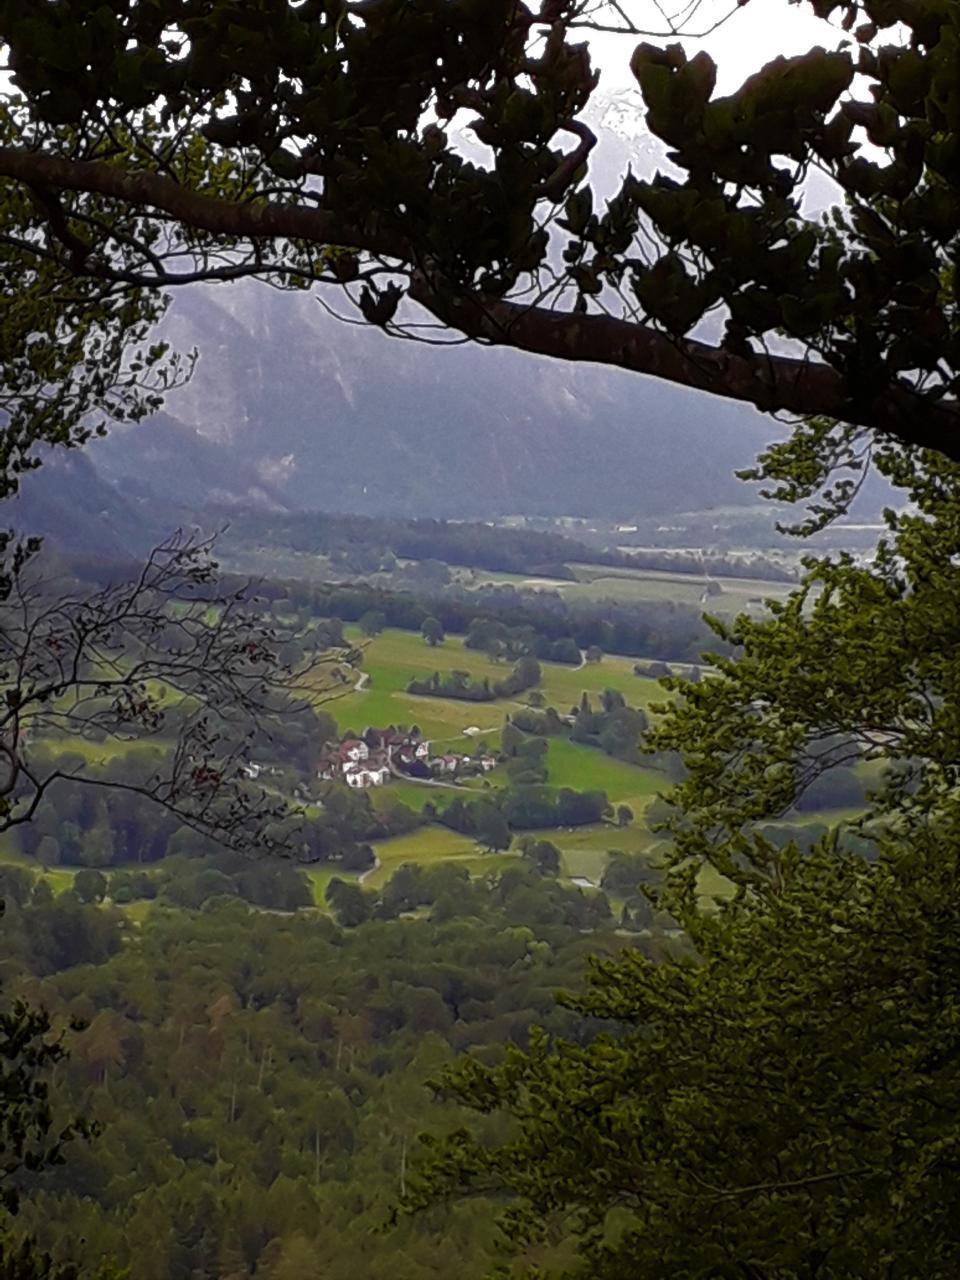 Maison de vacances Elfihuus***Sterne Ferienhaus im Heidiland mit 5 Zimmer (2528615), Maienfeld, Pays d'Heidi, Suisse Orientale, Suisse, image 13